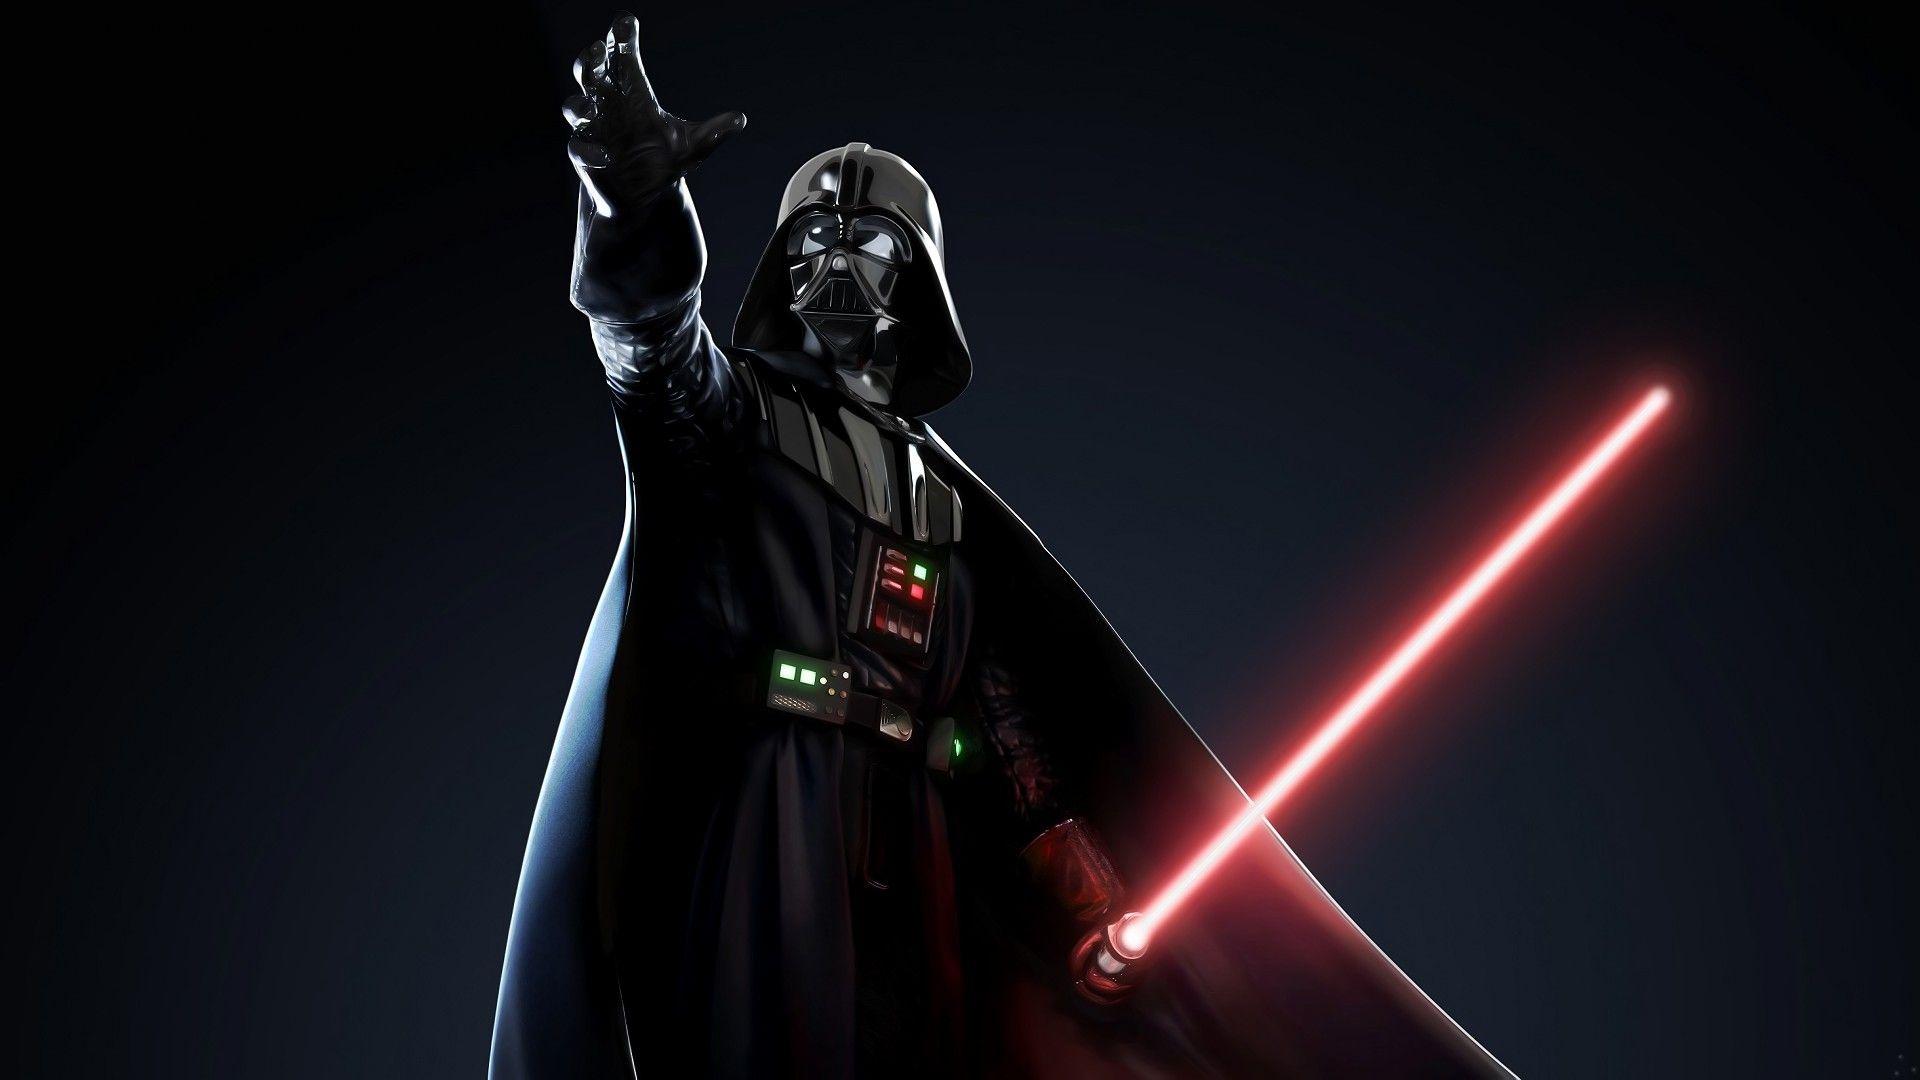 Dark Vador Wallpaper Android Star Wars Droidsoft